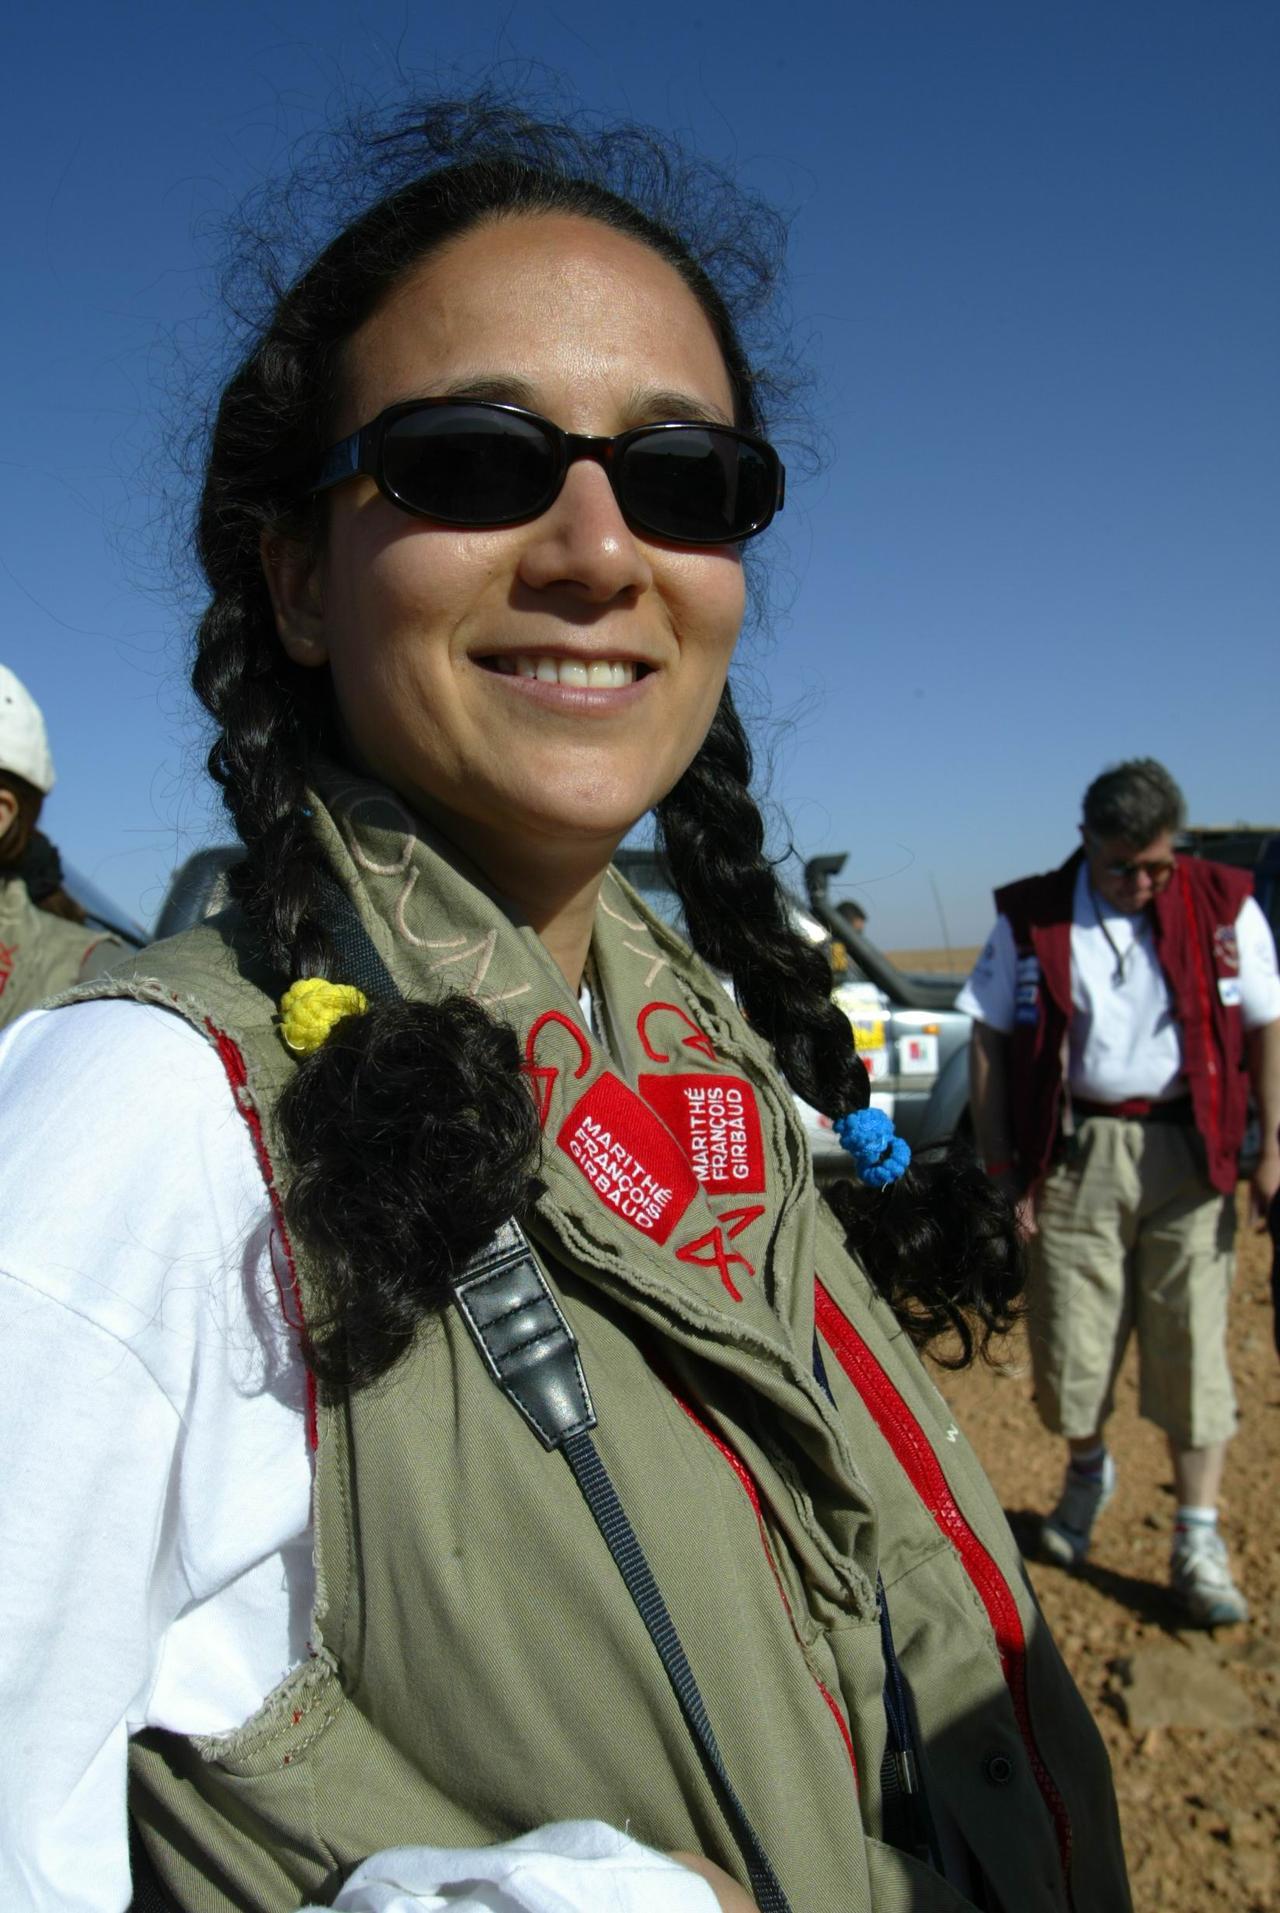 Rallye-Raid – Trans Africaine : Grégory Mourregot et Sophie Takenouti, pour la bonne cause !